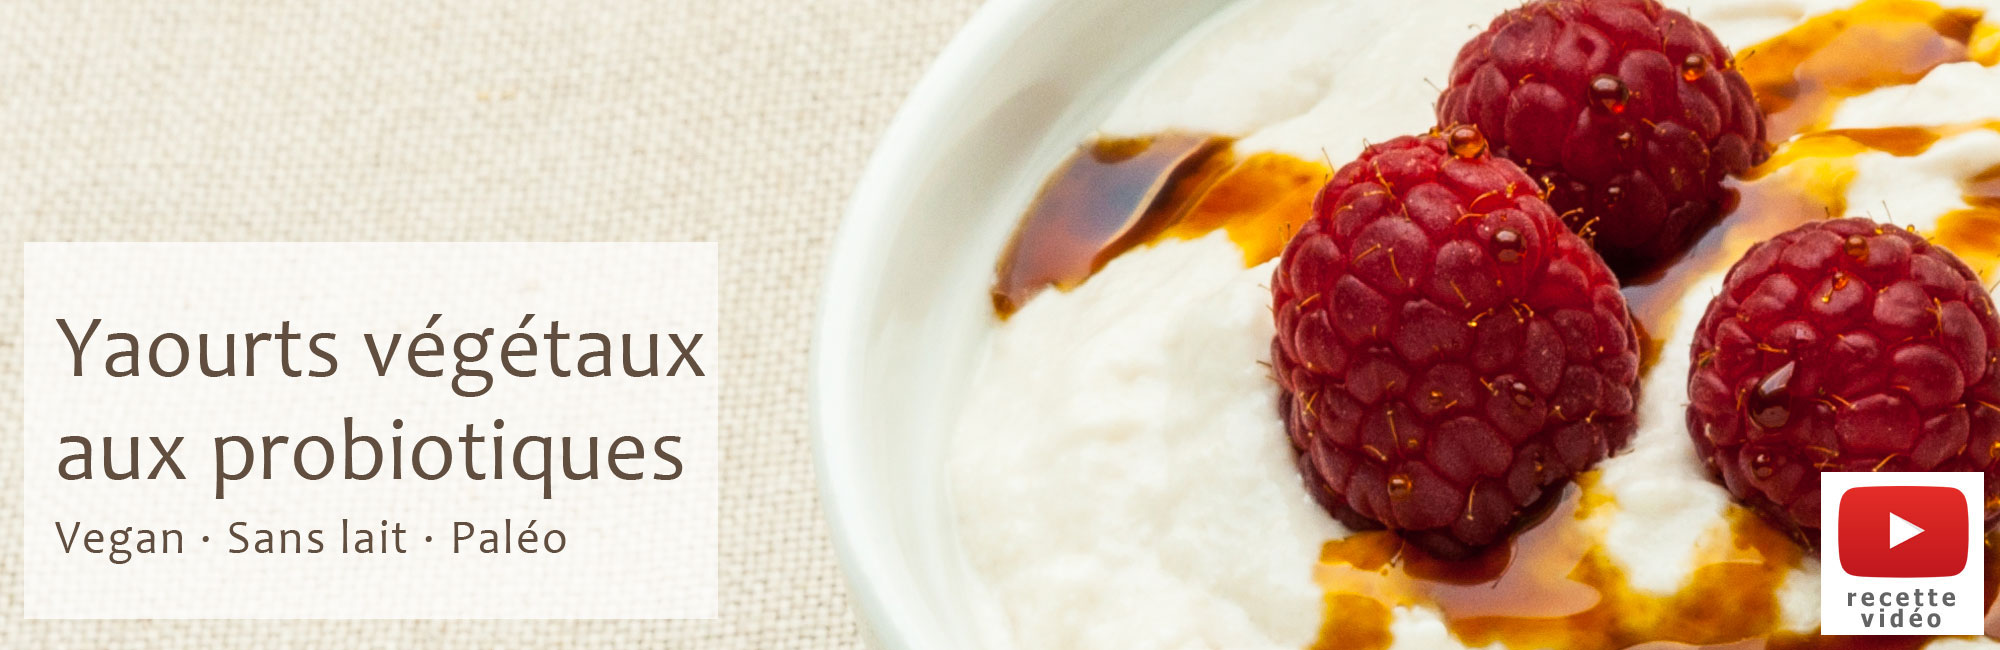 yaourts v g taux aux probiotiques vegan pal o blog. Black Bedroom Furniture Sets. Home Design Ideas